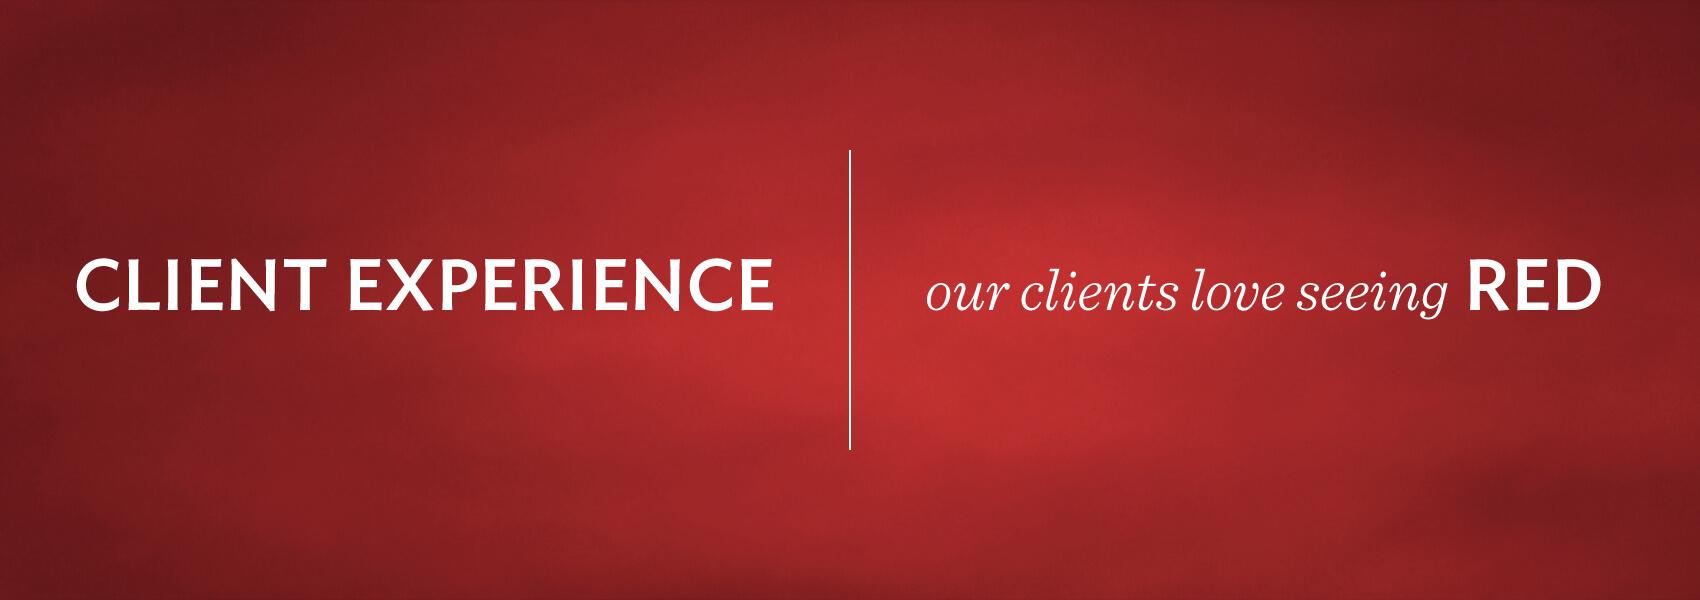 marketing-services-companies